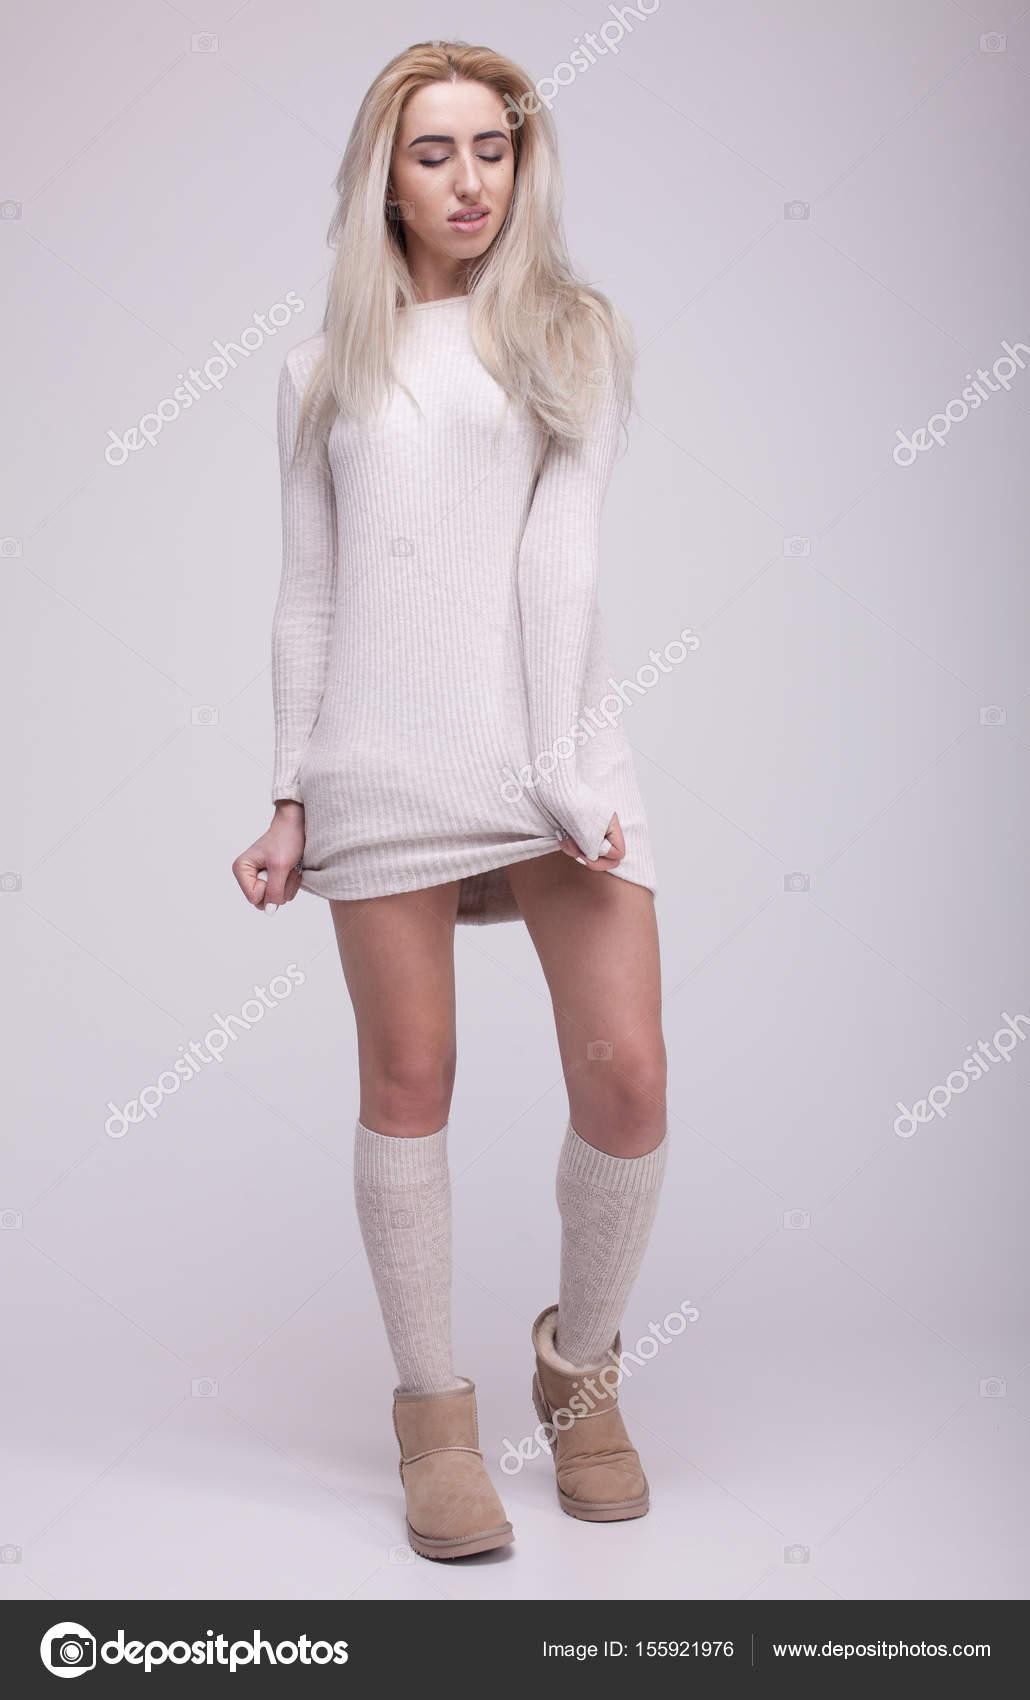 066dce1f4678 Μόδα Μπότες χειμώνα. Ζεστά Χειμωνιάτικα γυναικεία ρούχα. Casual στυλ ...